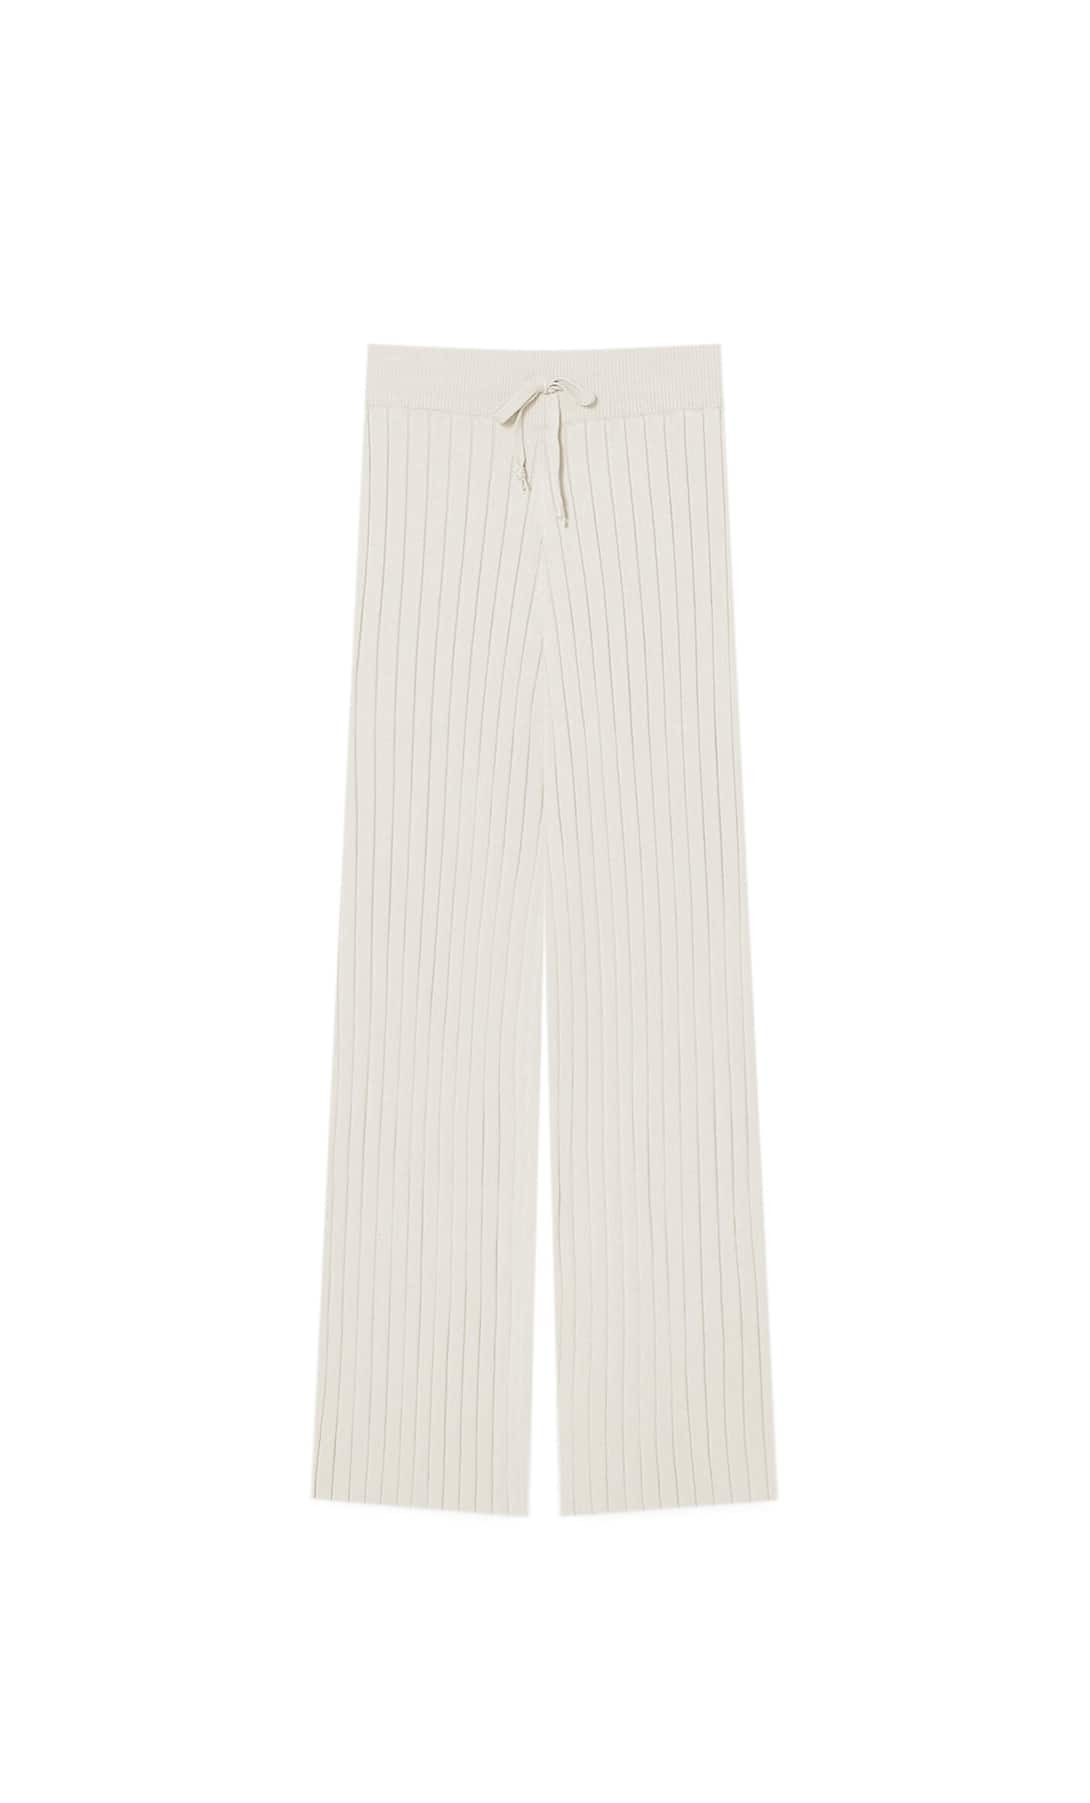 Pantalón de punto con corte culotte de Stradivarius